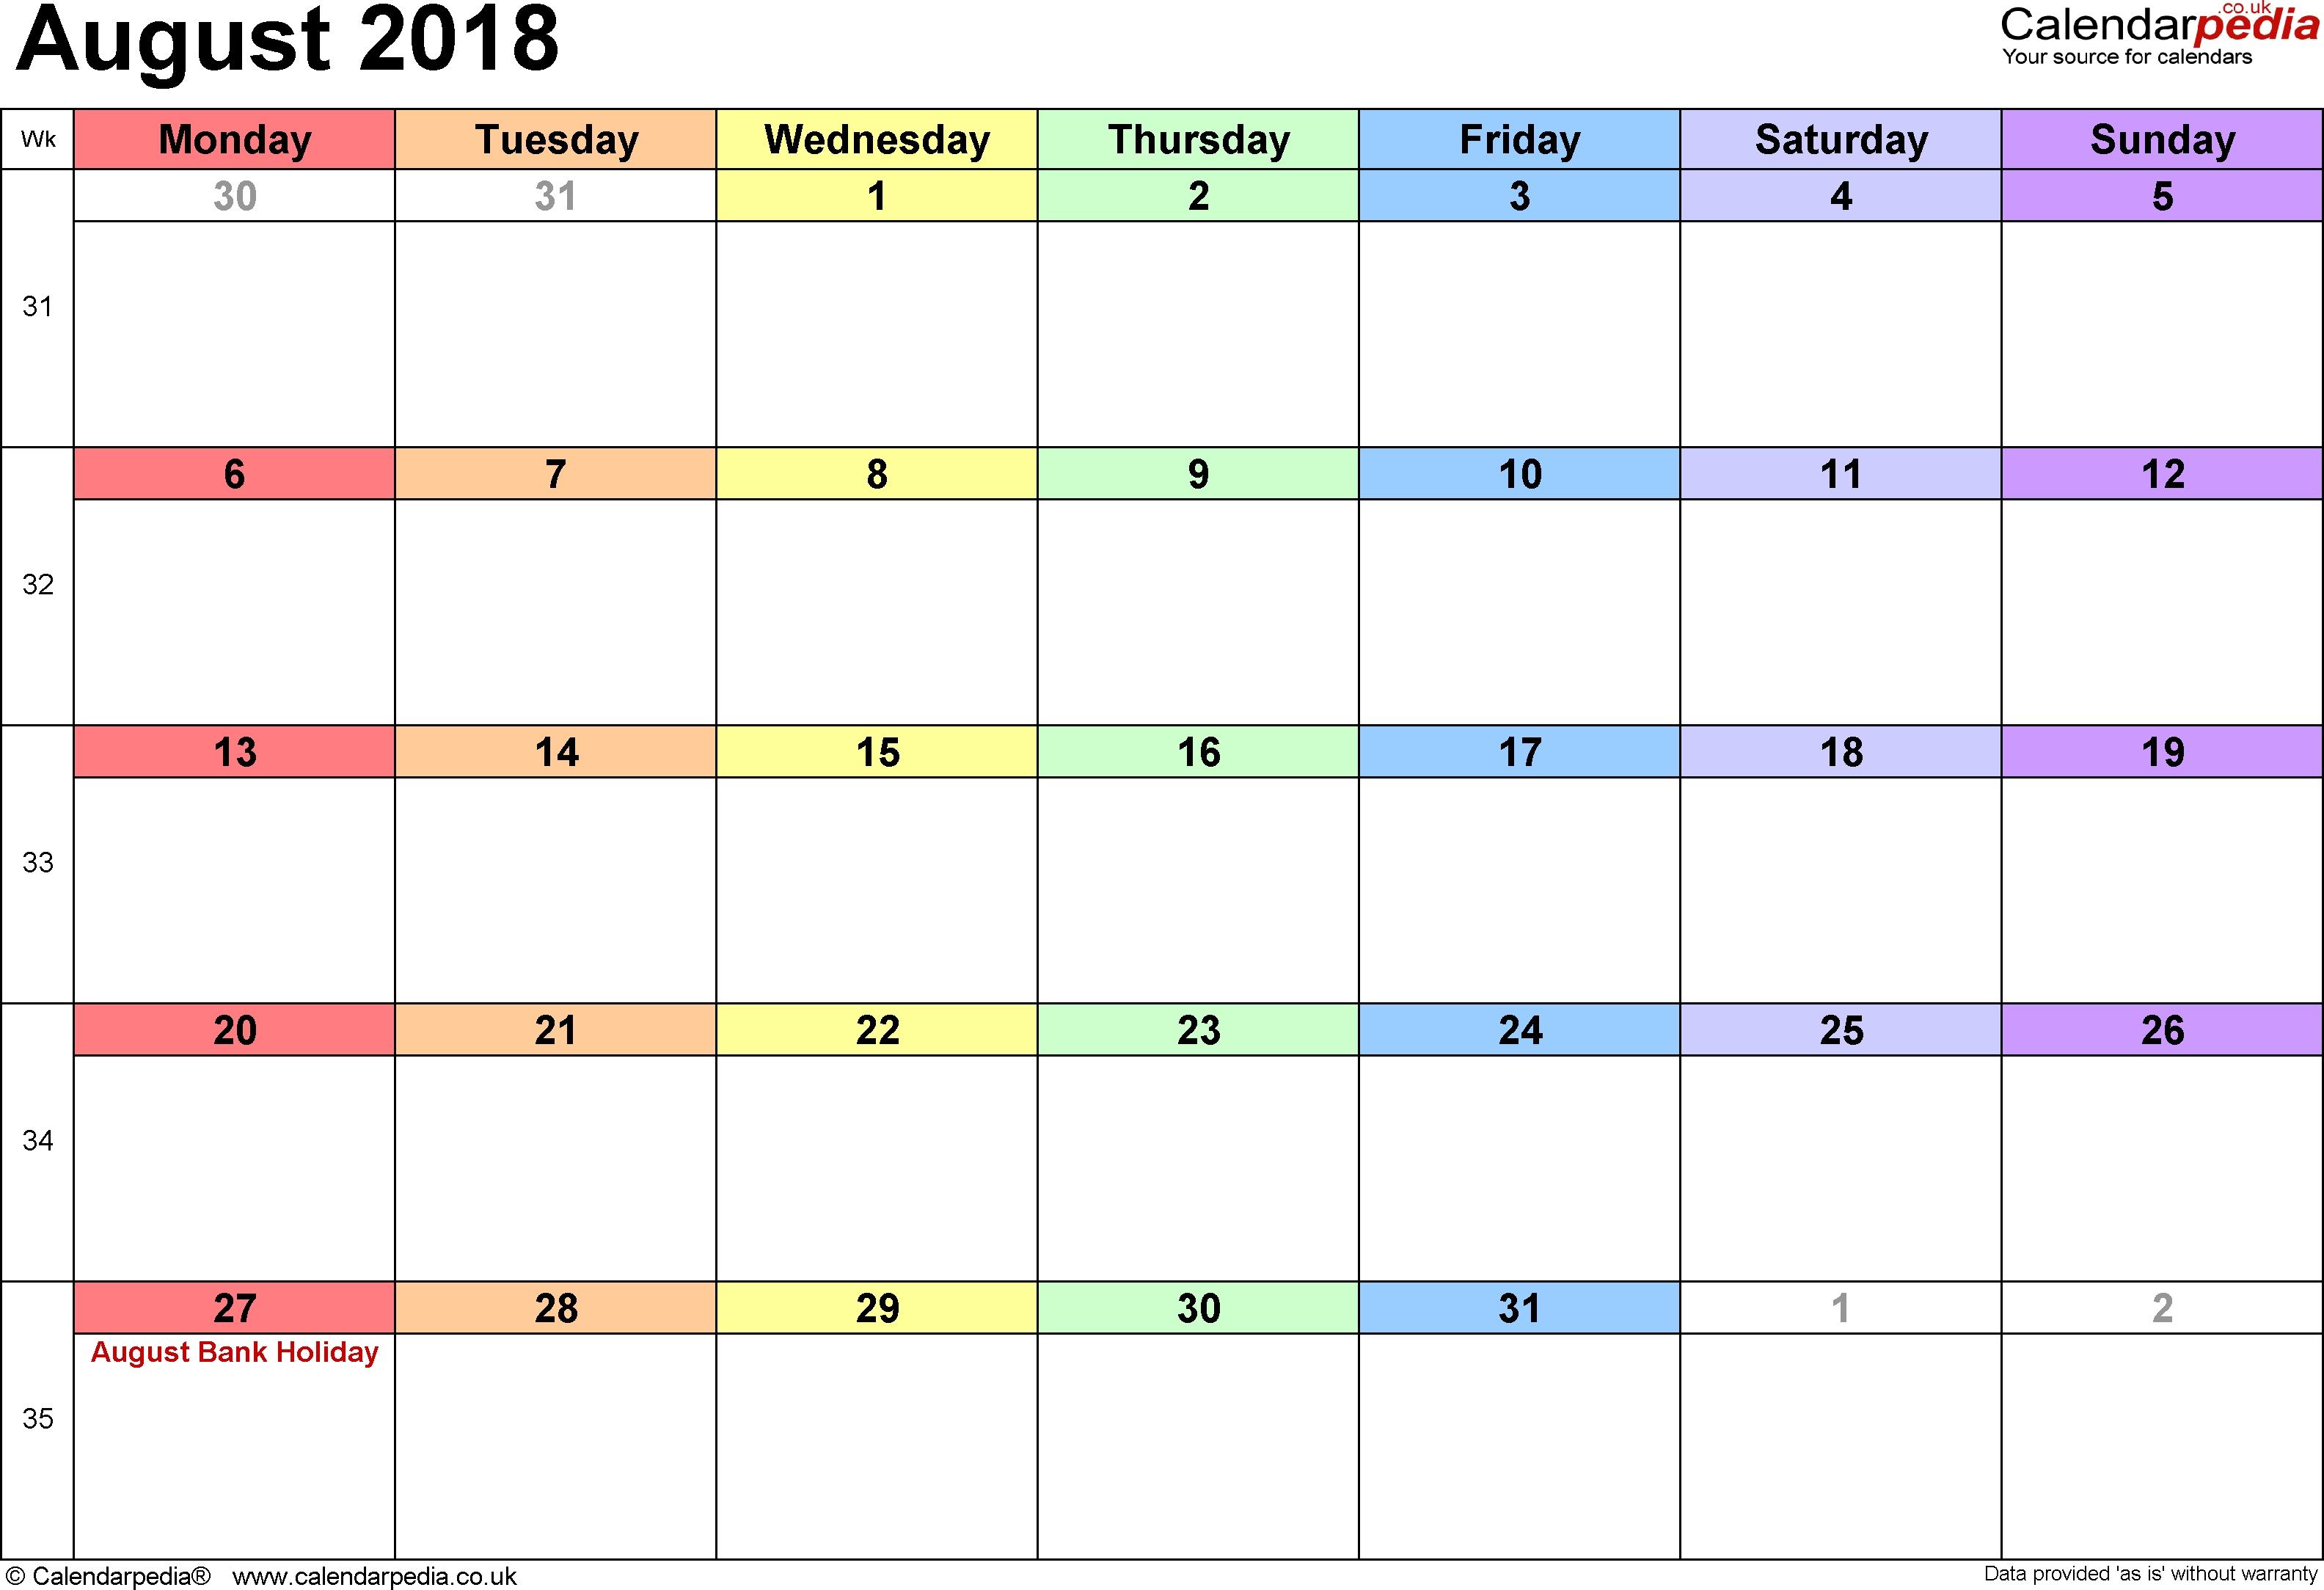 Calendar August 2018 Uk, Bank Holidays, Excel/pdf/word Templates regarding 3 Month Printable Calendar Online August